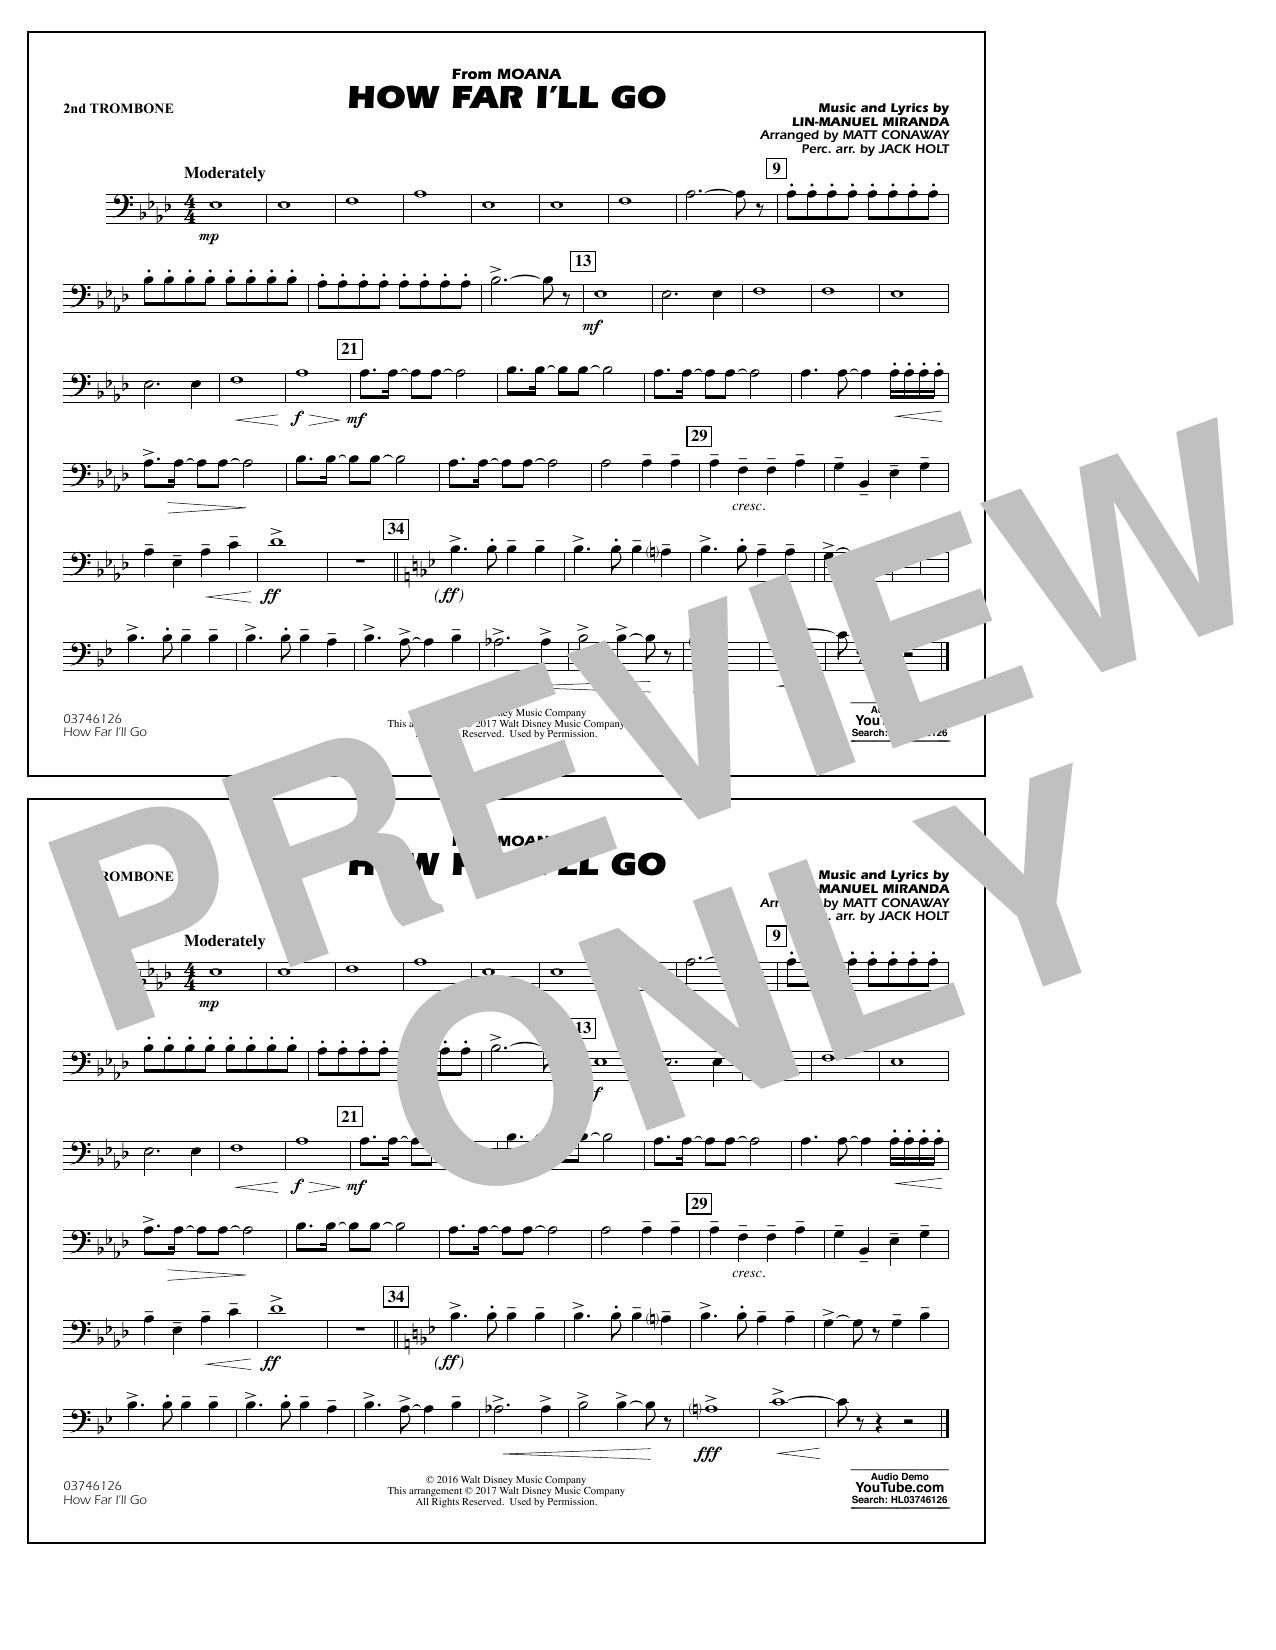 How Far I'll Go (from Moana) - 2nd Trombone Sheet Music